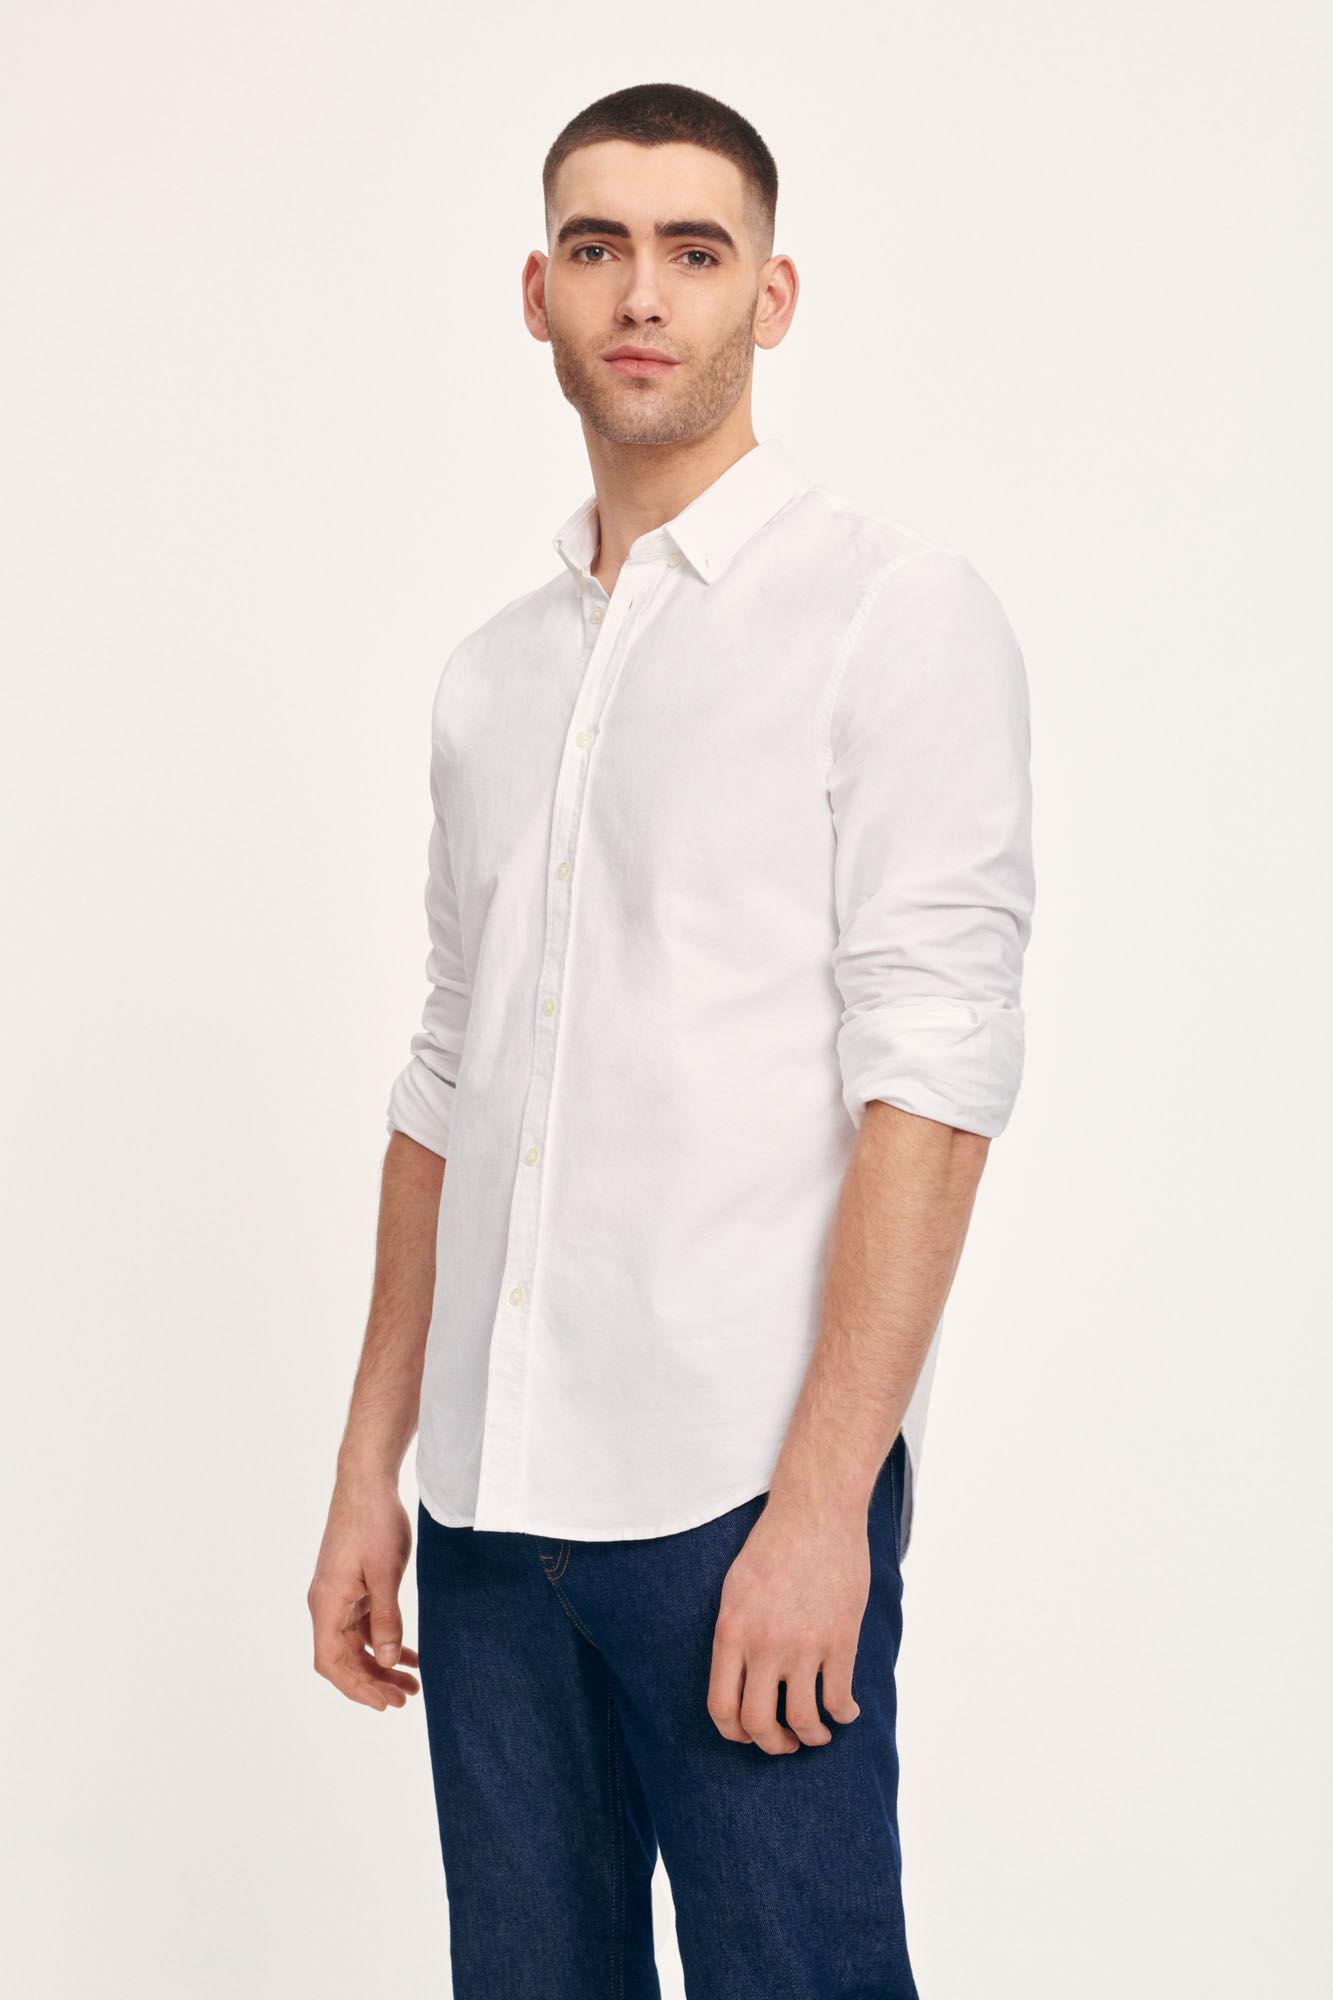 Liam BX shirt 11389